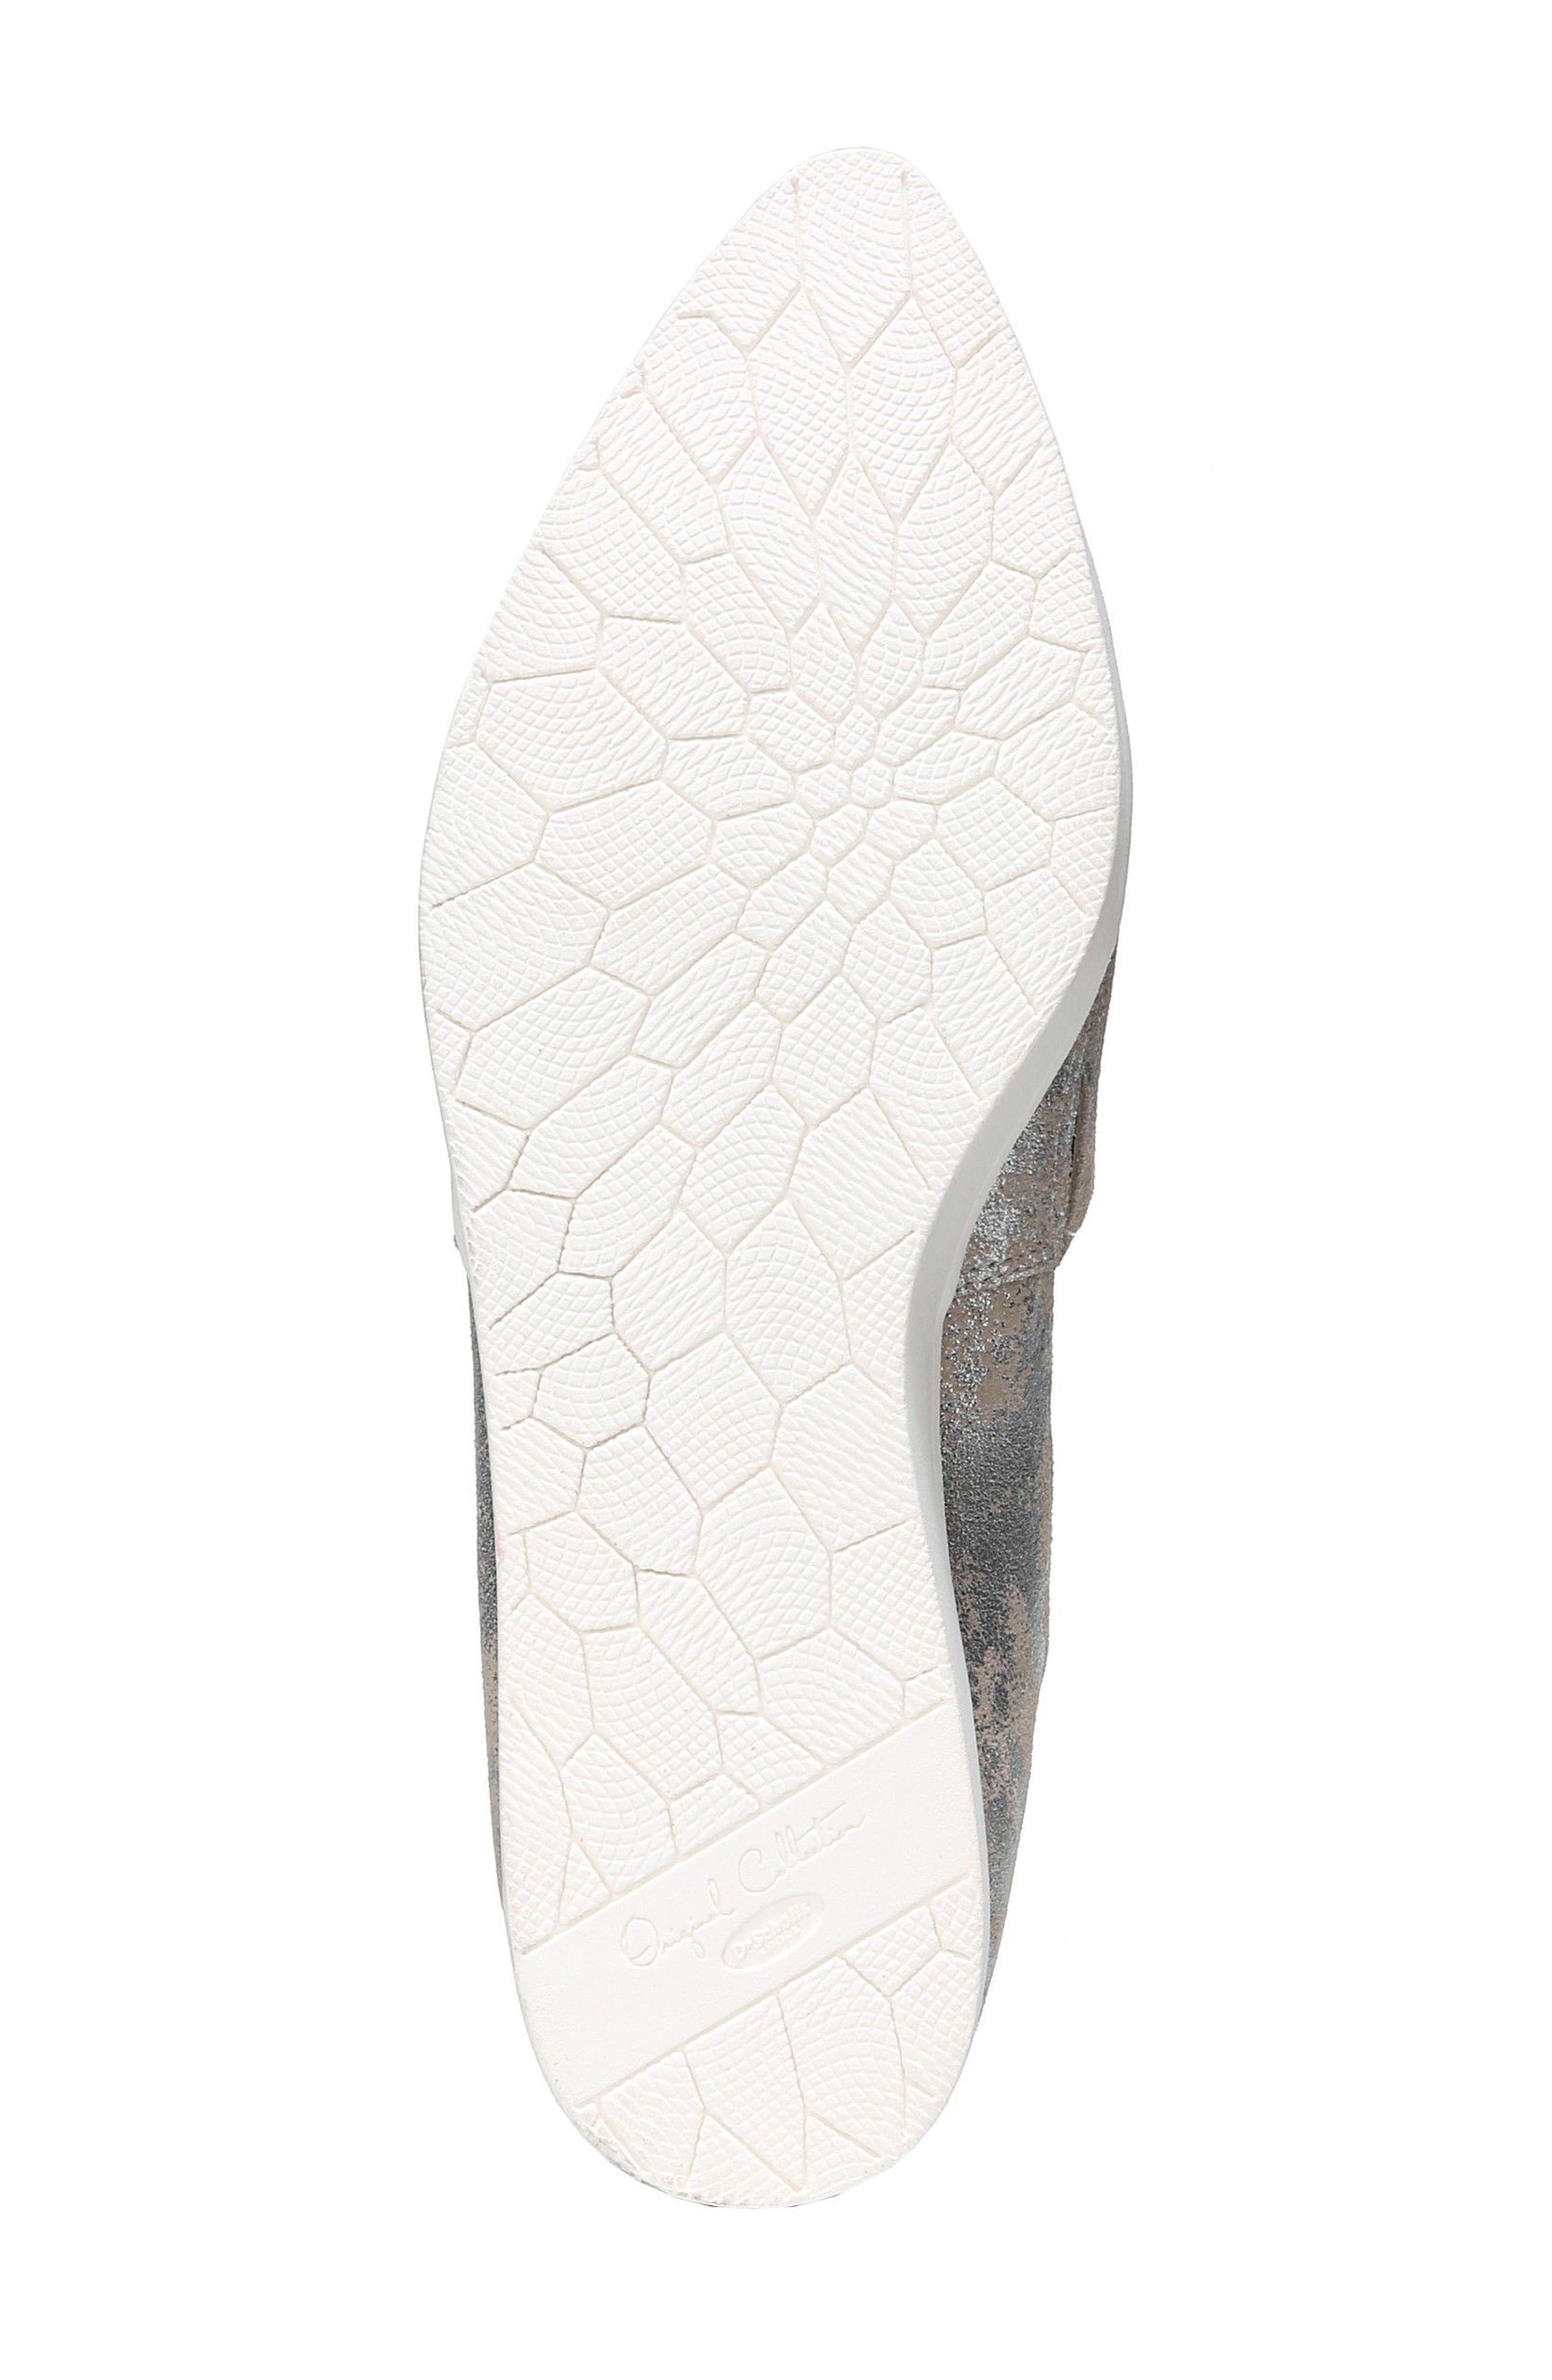 'Vienna' Slip-on Sneaker,                             Alternate thumbnail 6, color,                             040